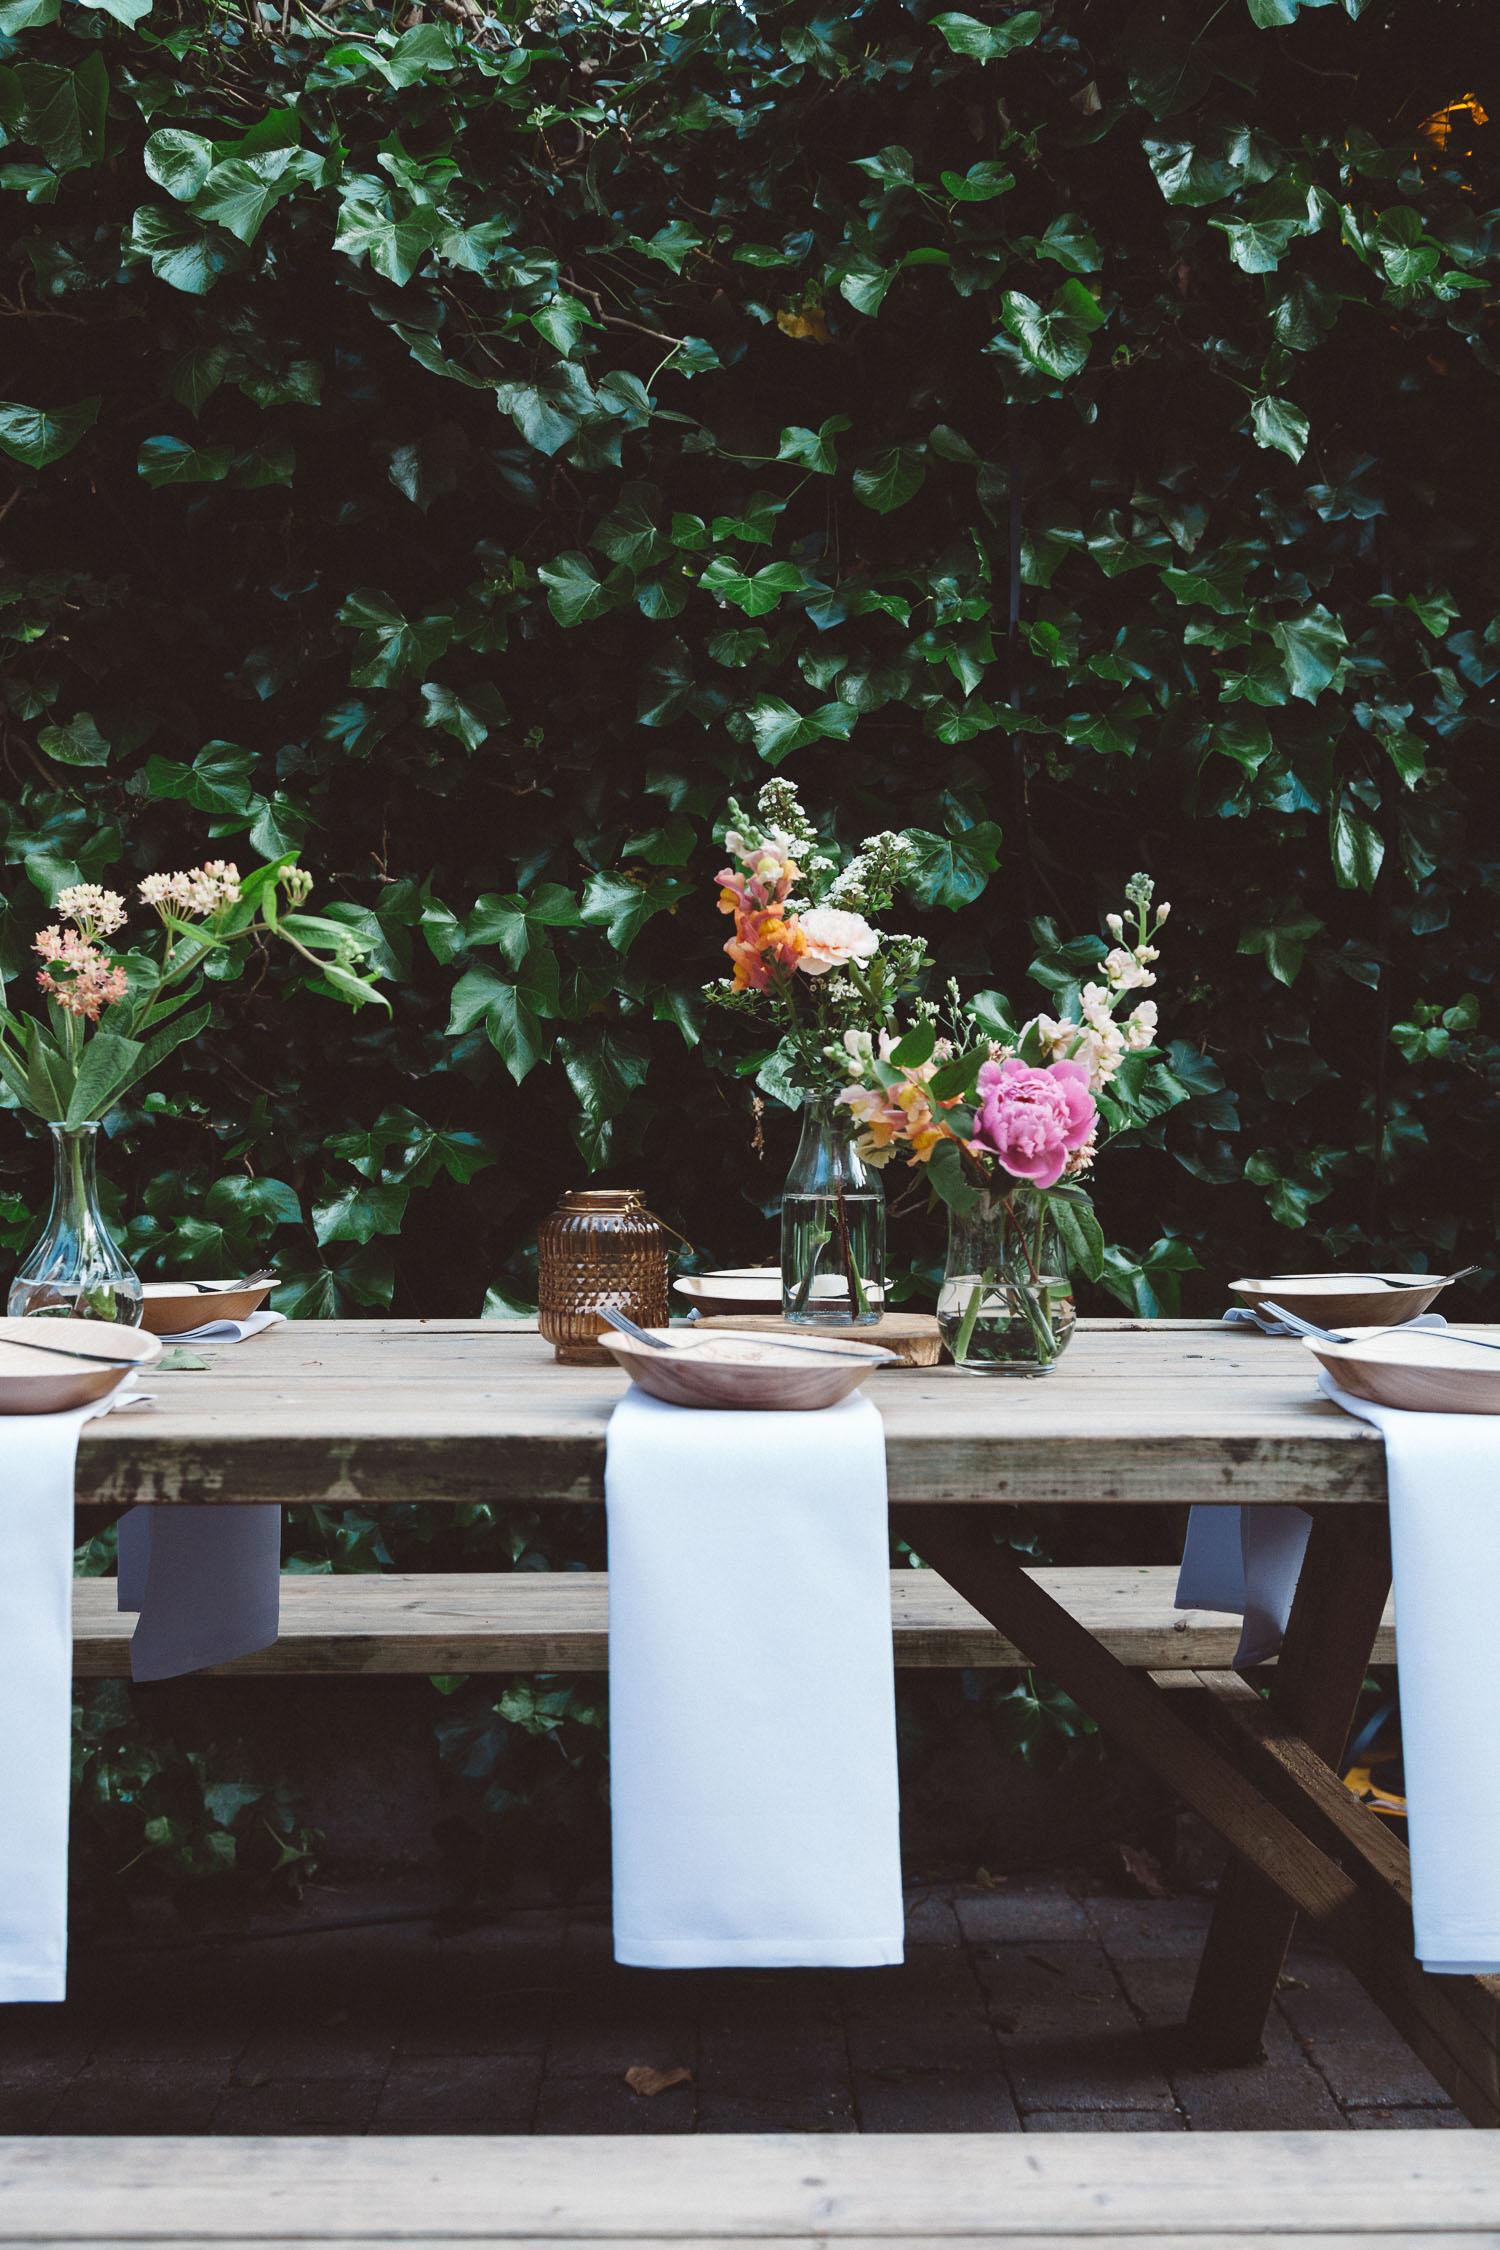 Backyard-wedding-Bruiloft-Annemiek-David-fotografie-photography-On-a-hazy-morning-Amsterdam-The-Netherlands368.jpg